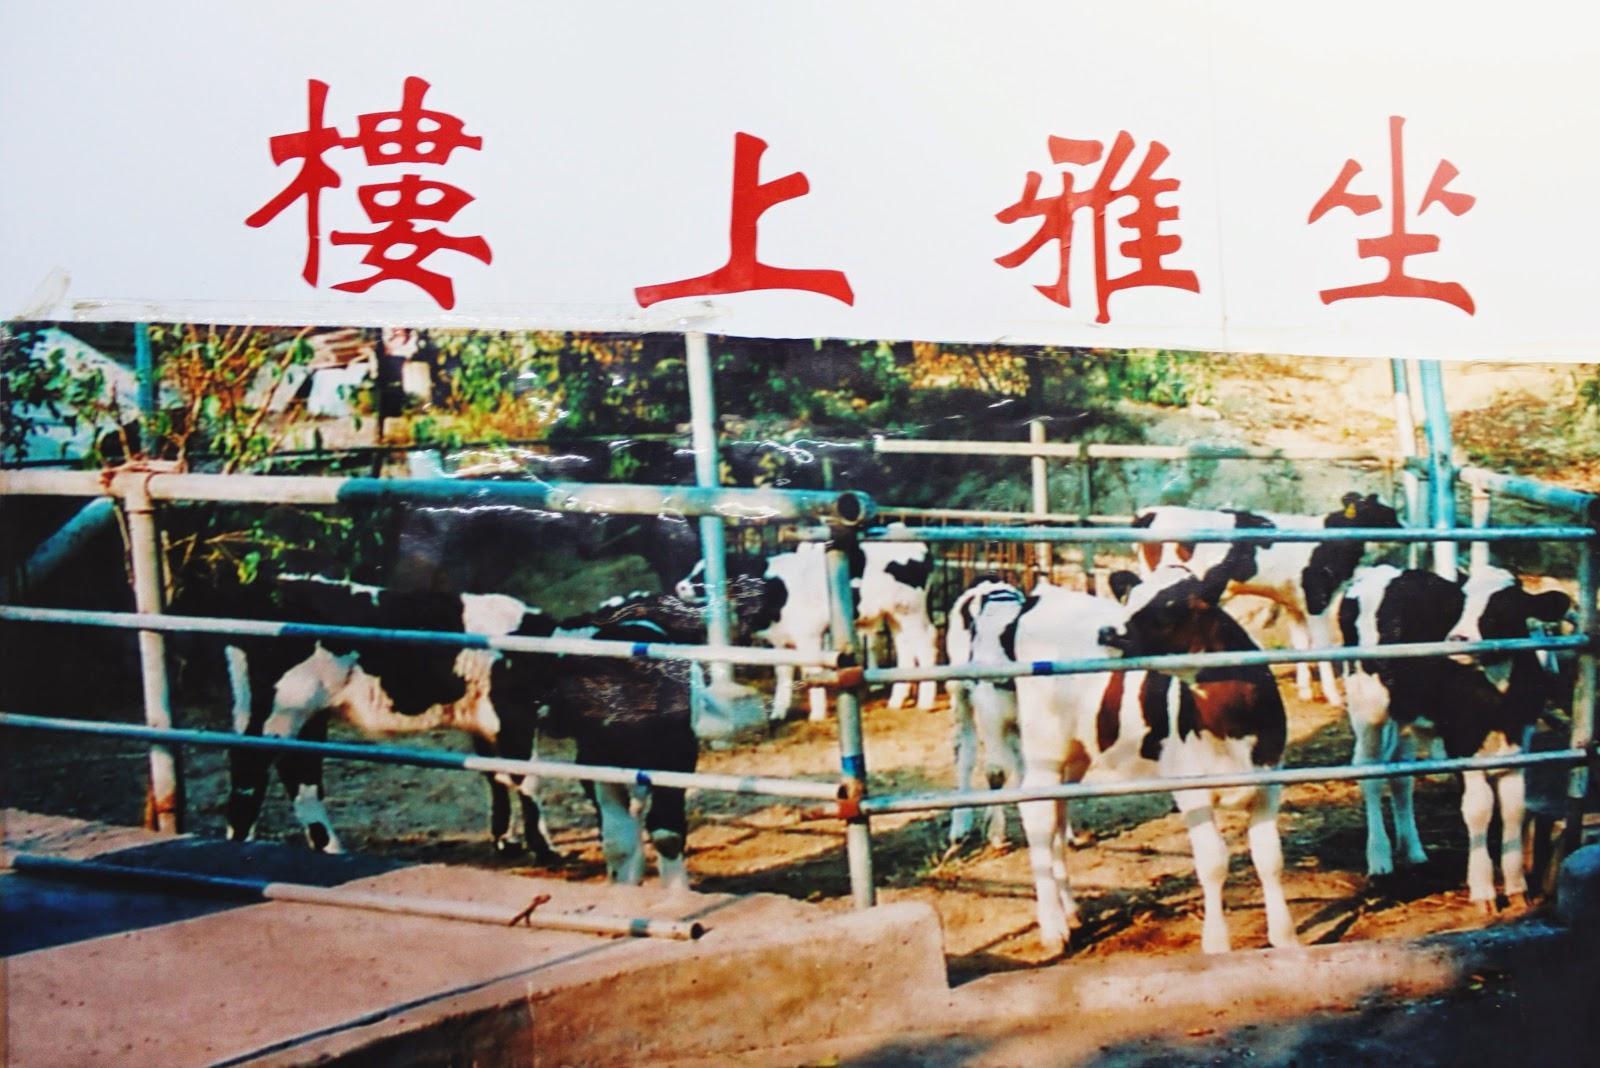 薑汁撞奶 Ginger Milk Curd , 義順牛奶公司 Yee Shun Milk Company @ 澳門新馬路20號 Senado Square, Macau